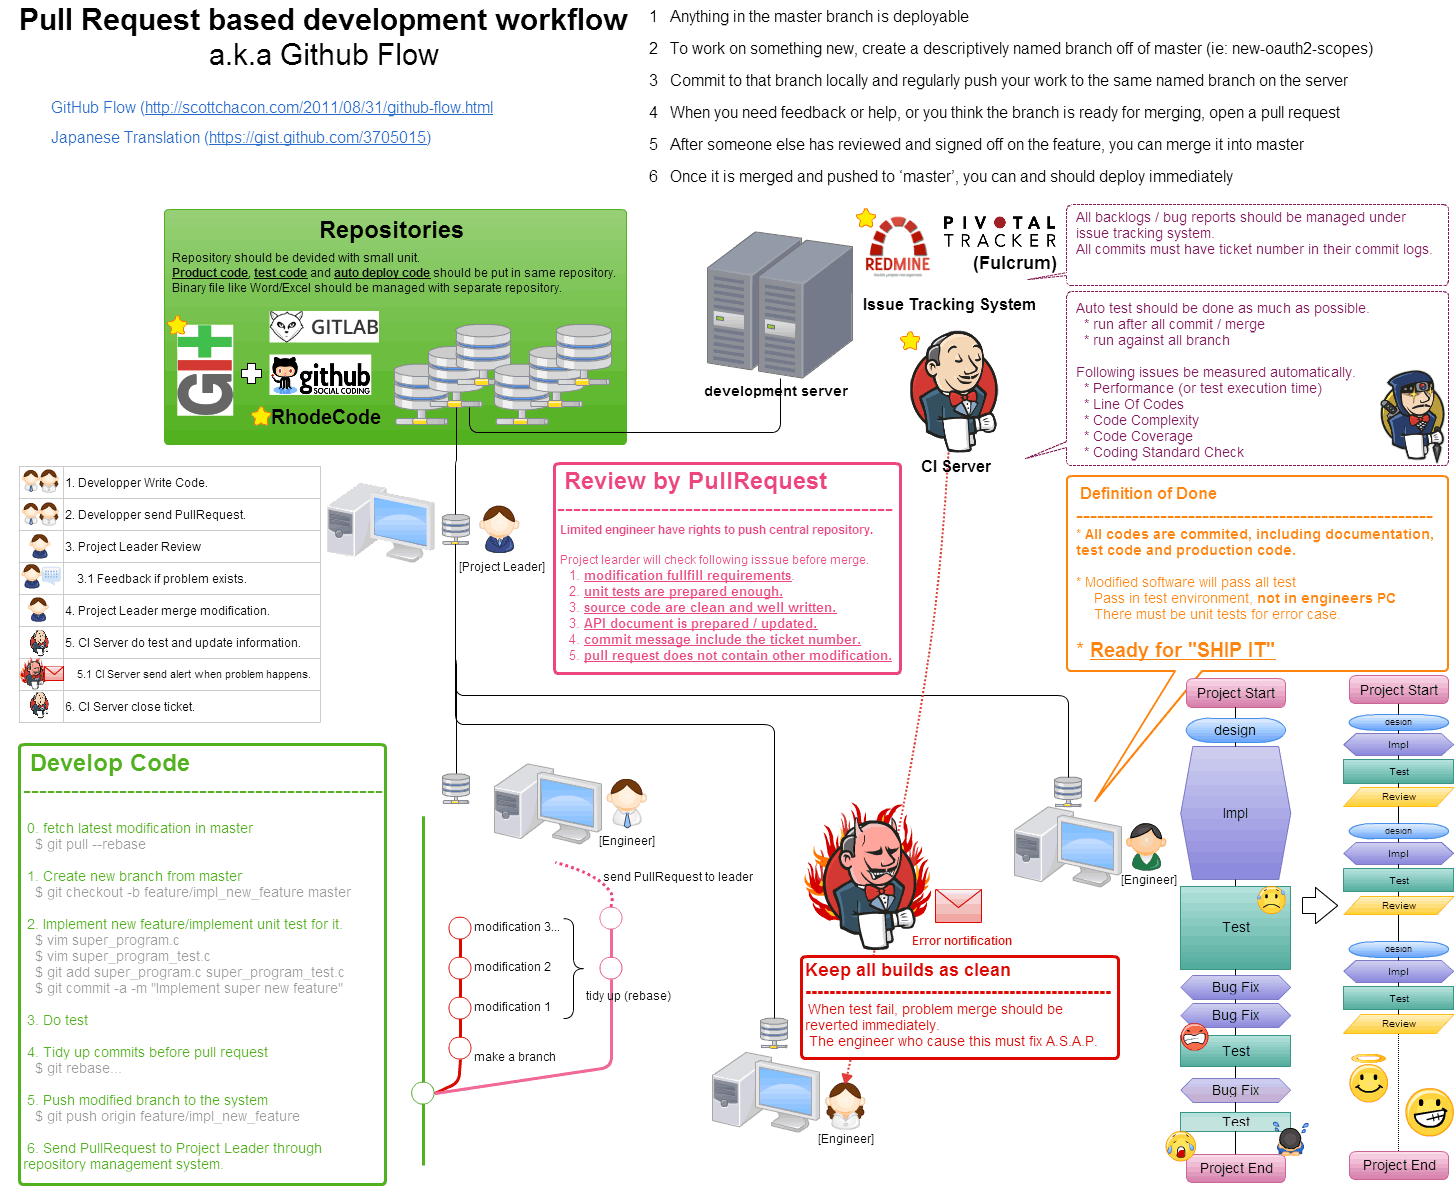 PullRequestベースの開発フロー説明図